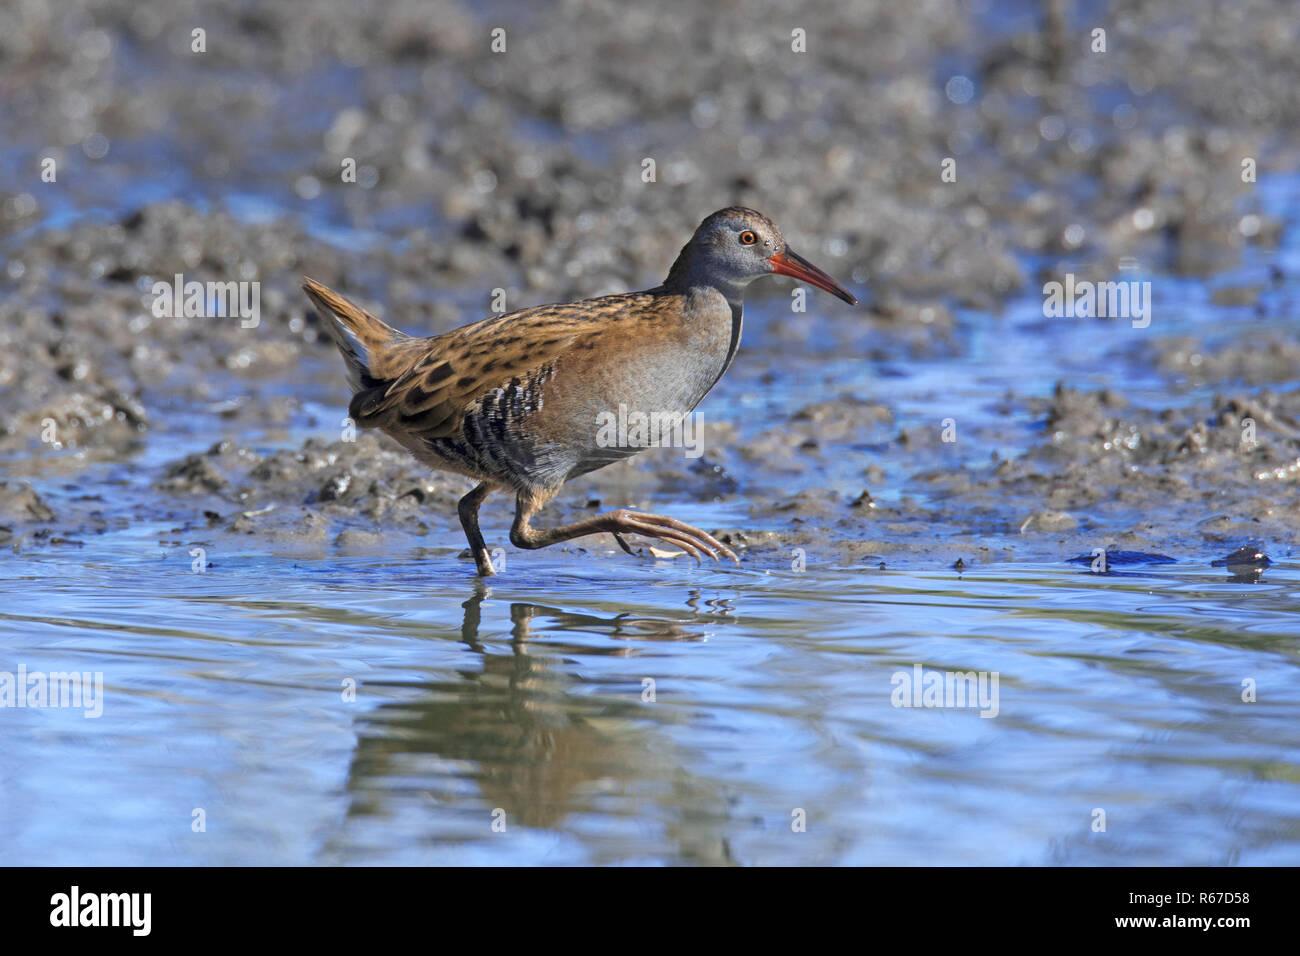 Water rail (Rallus aquaticus) foraging in shallow water in wetland / marsh / marshland - Stock Image